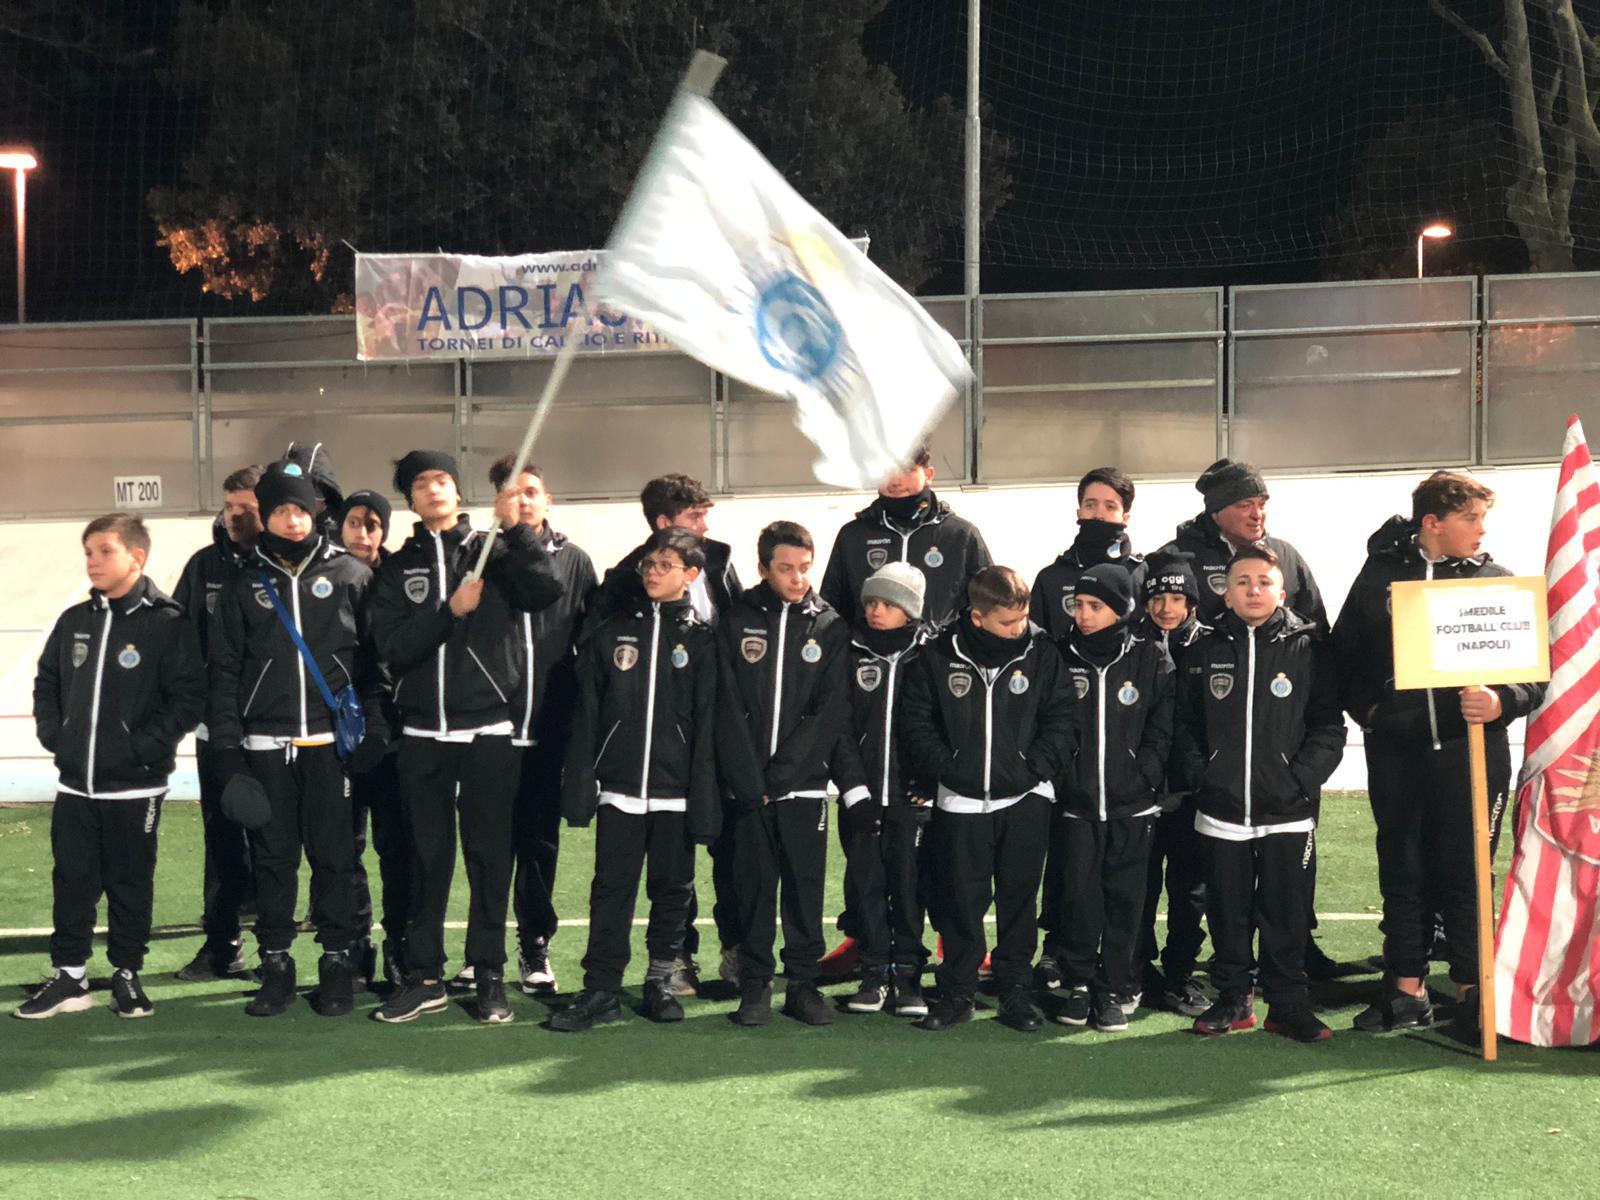 Torneo della Befana – Firenze 2019